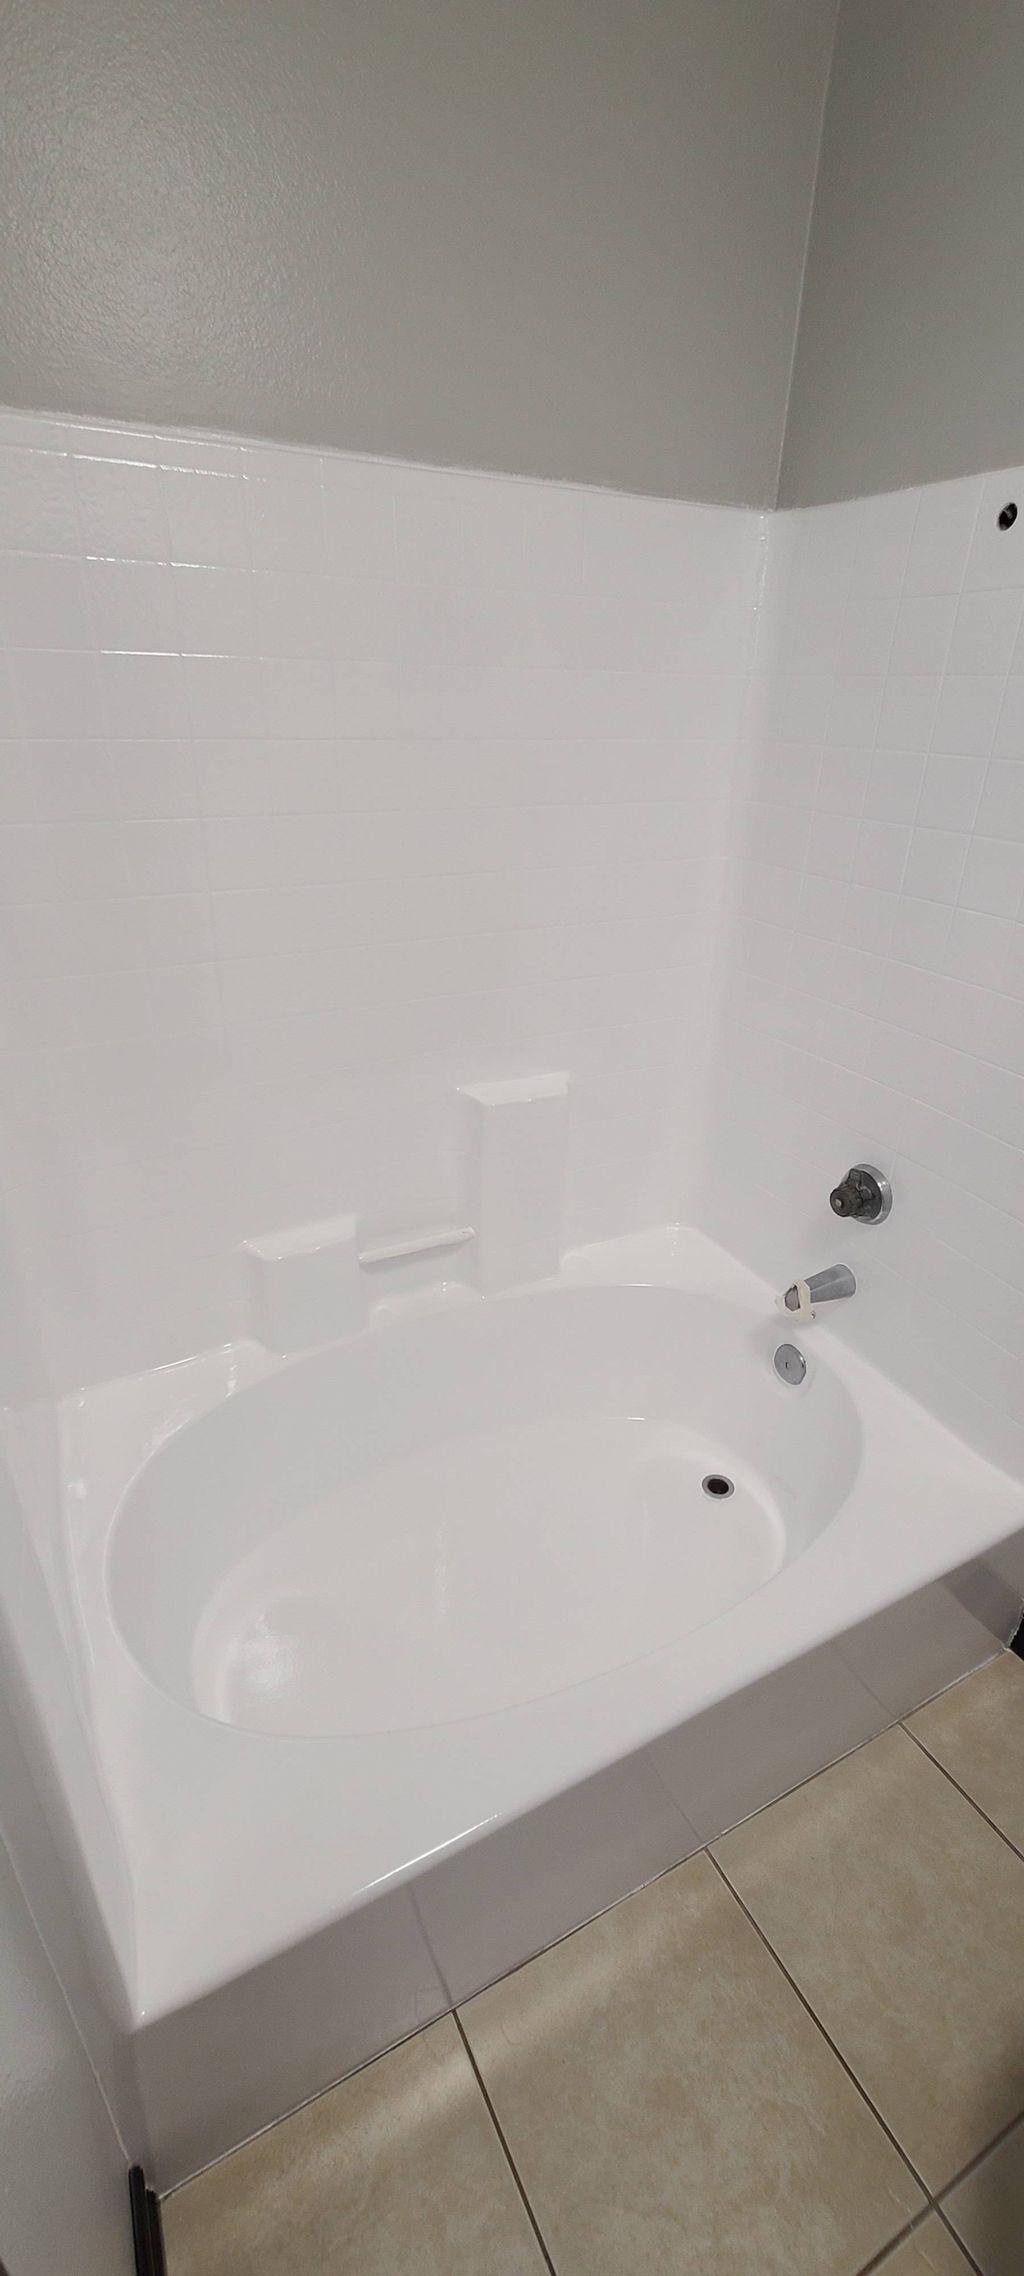 Shower and Bathtub Repair - Fontana 2020